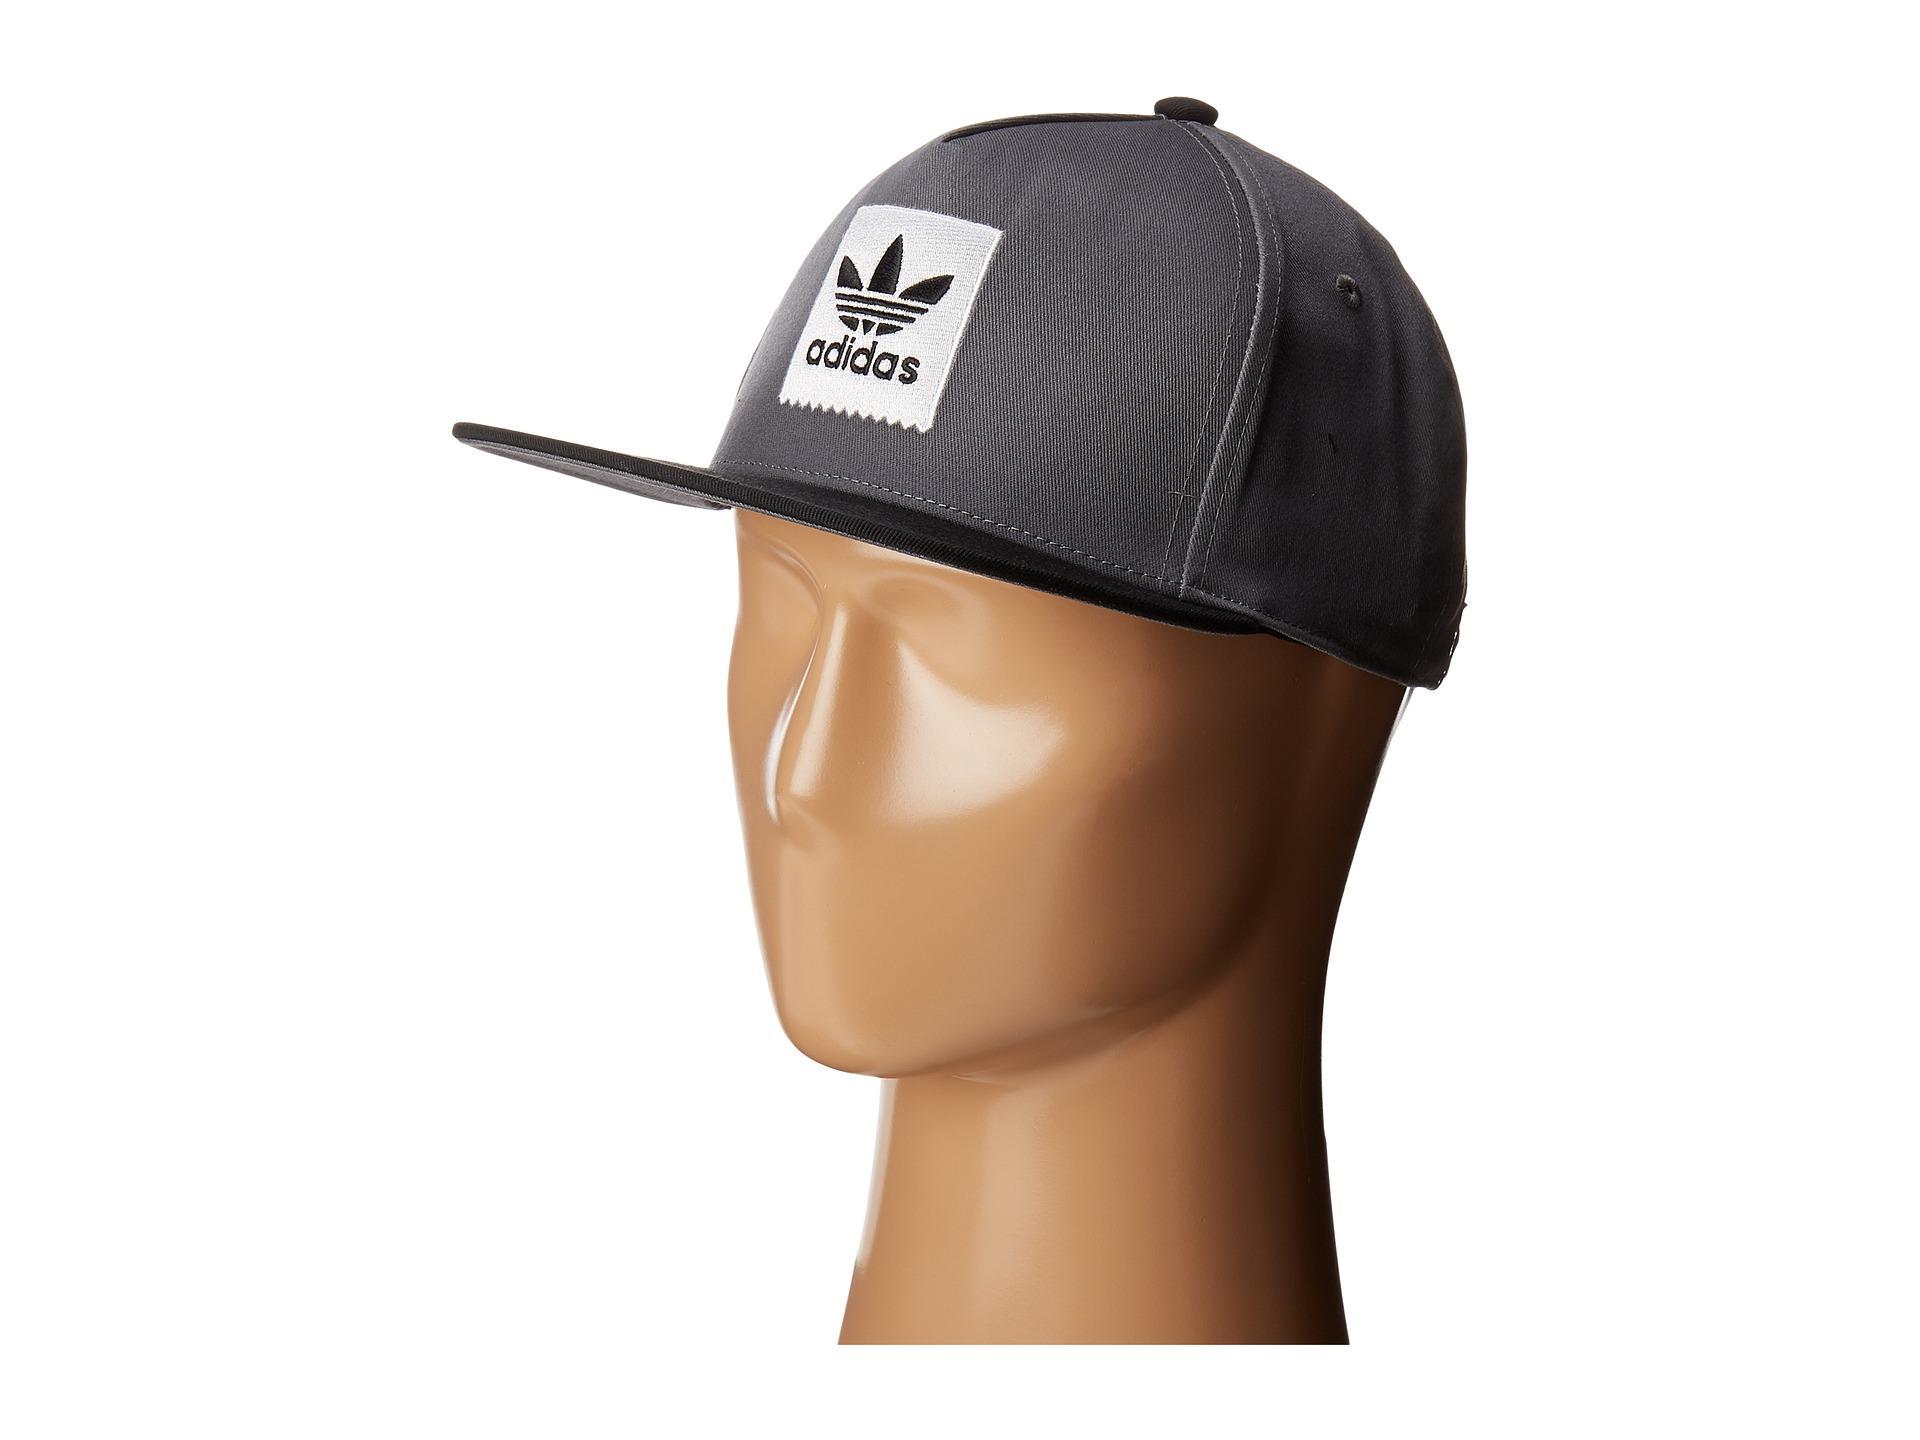 5f0d11ba26d48 Lyst - adidas Originals Two-tone Blackbird Snapback Hat in Gray for Men